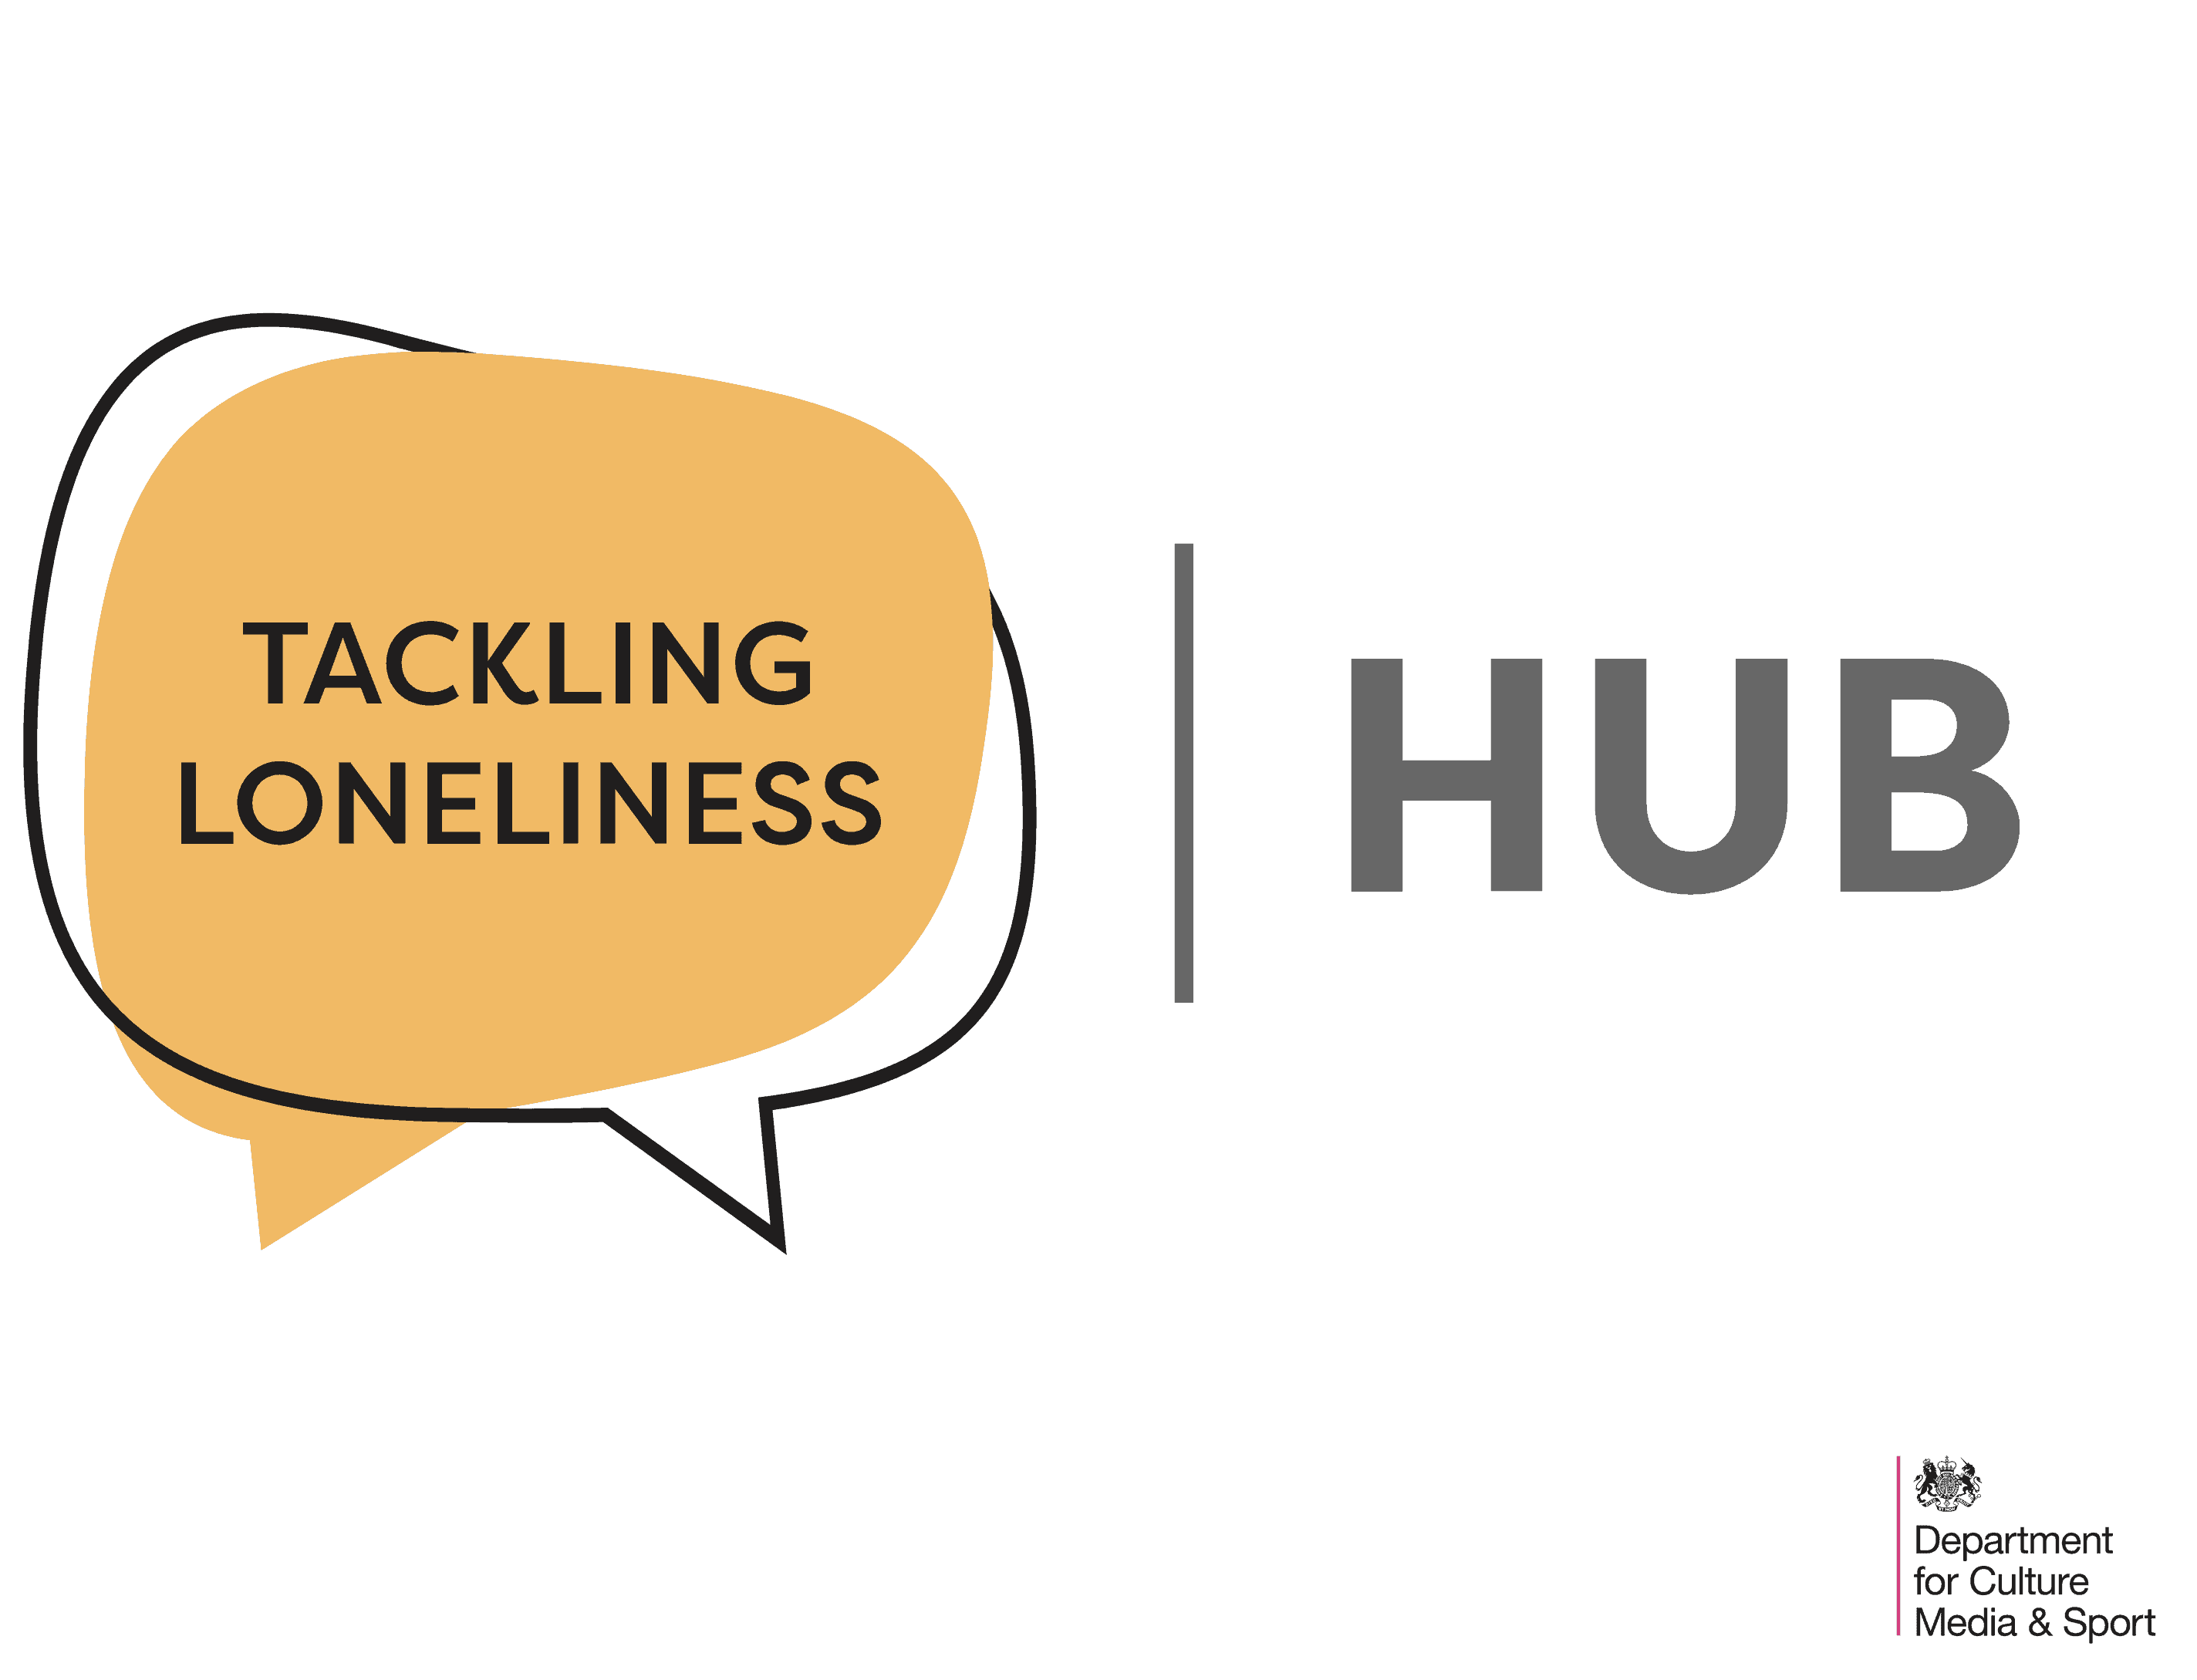 tackling-loneliness hub